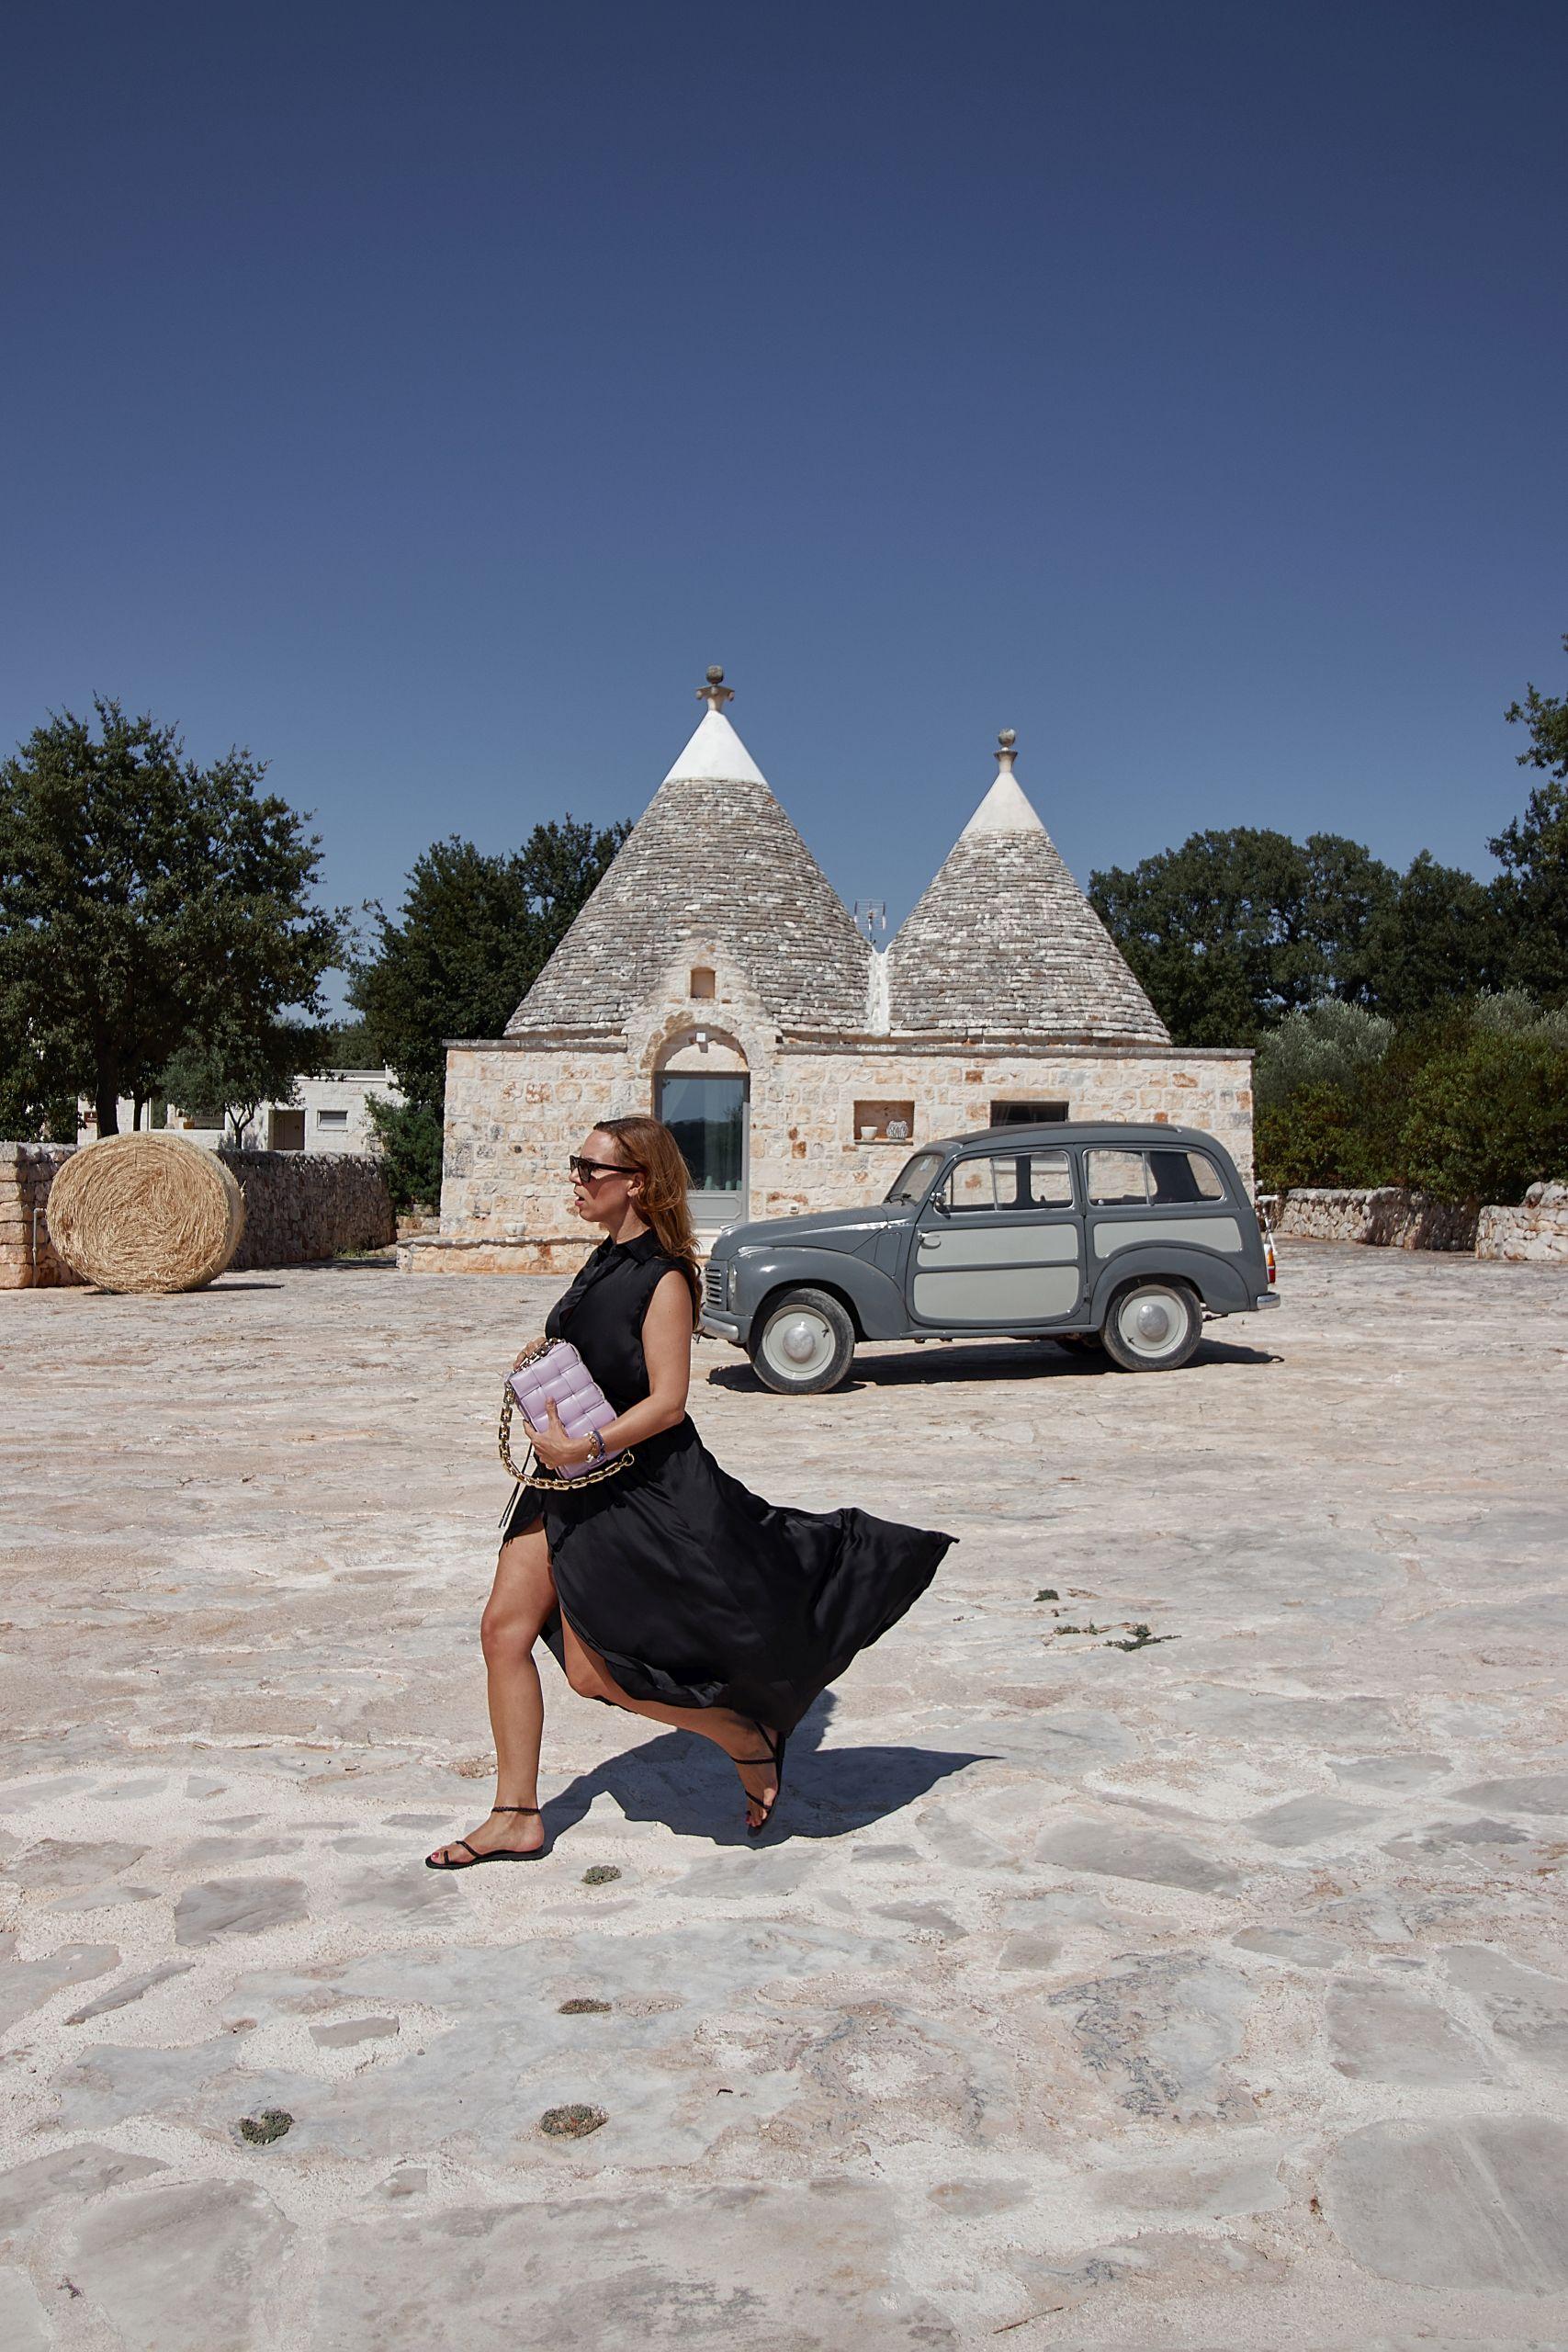 Francesca Geraci Couture Seidenkleid in der Masseria Grieco